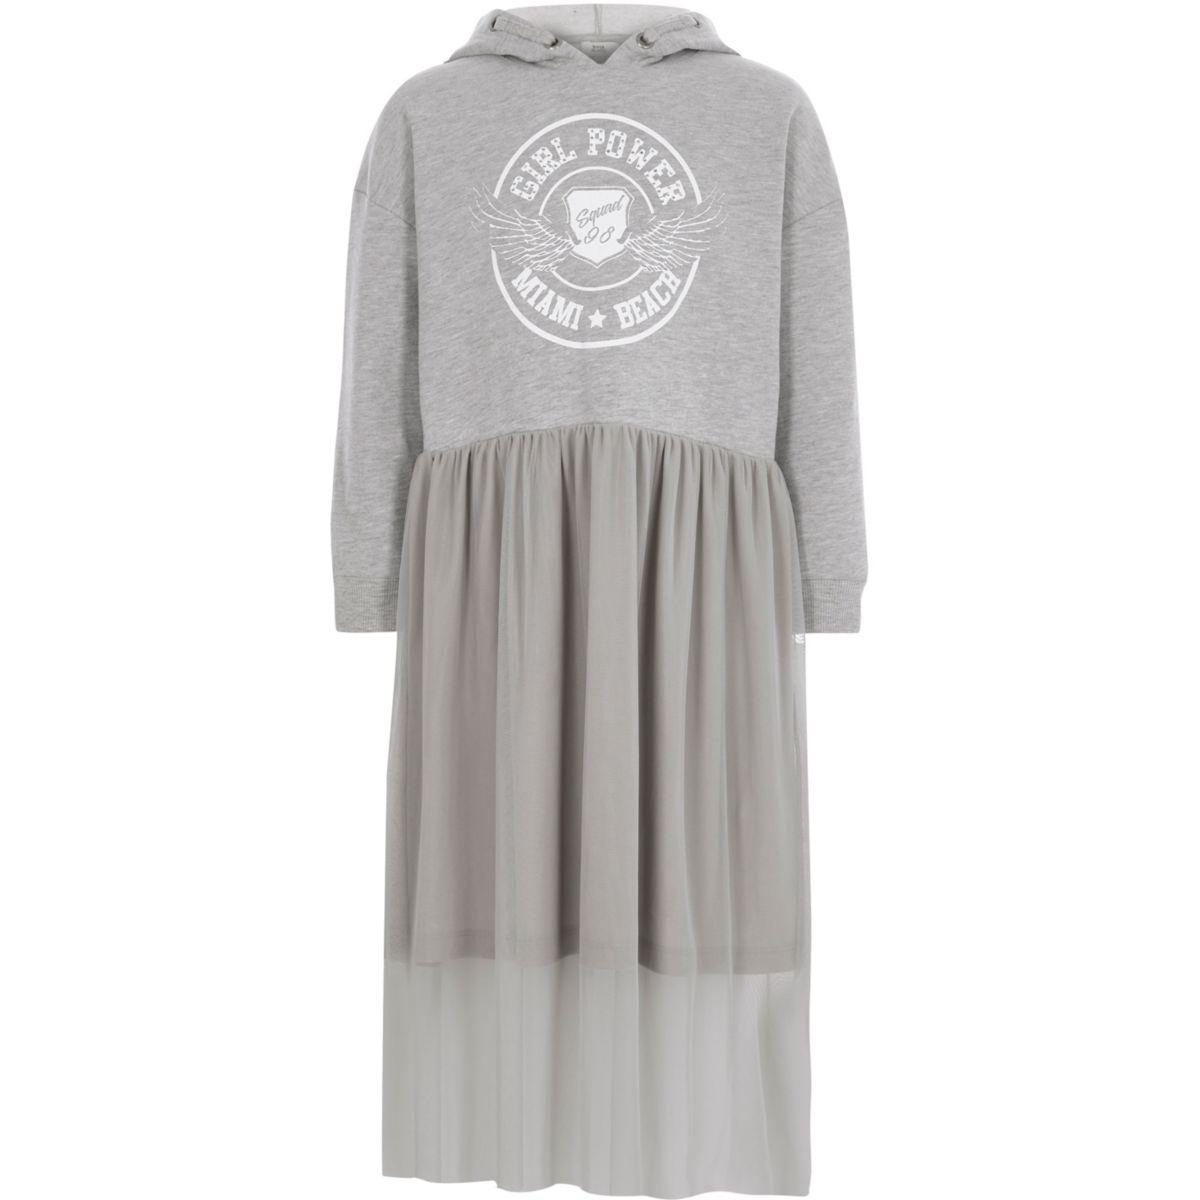 Girls grey hoodie mesh skirt dress